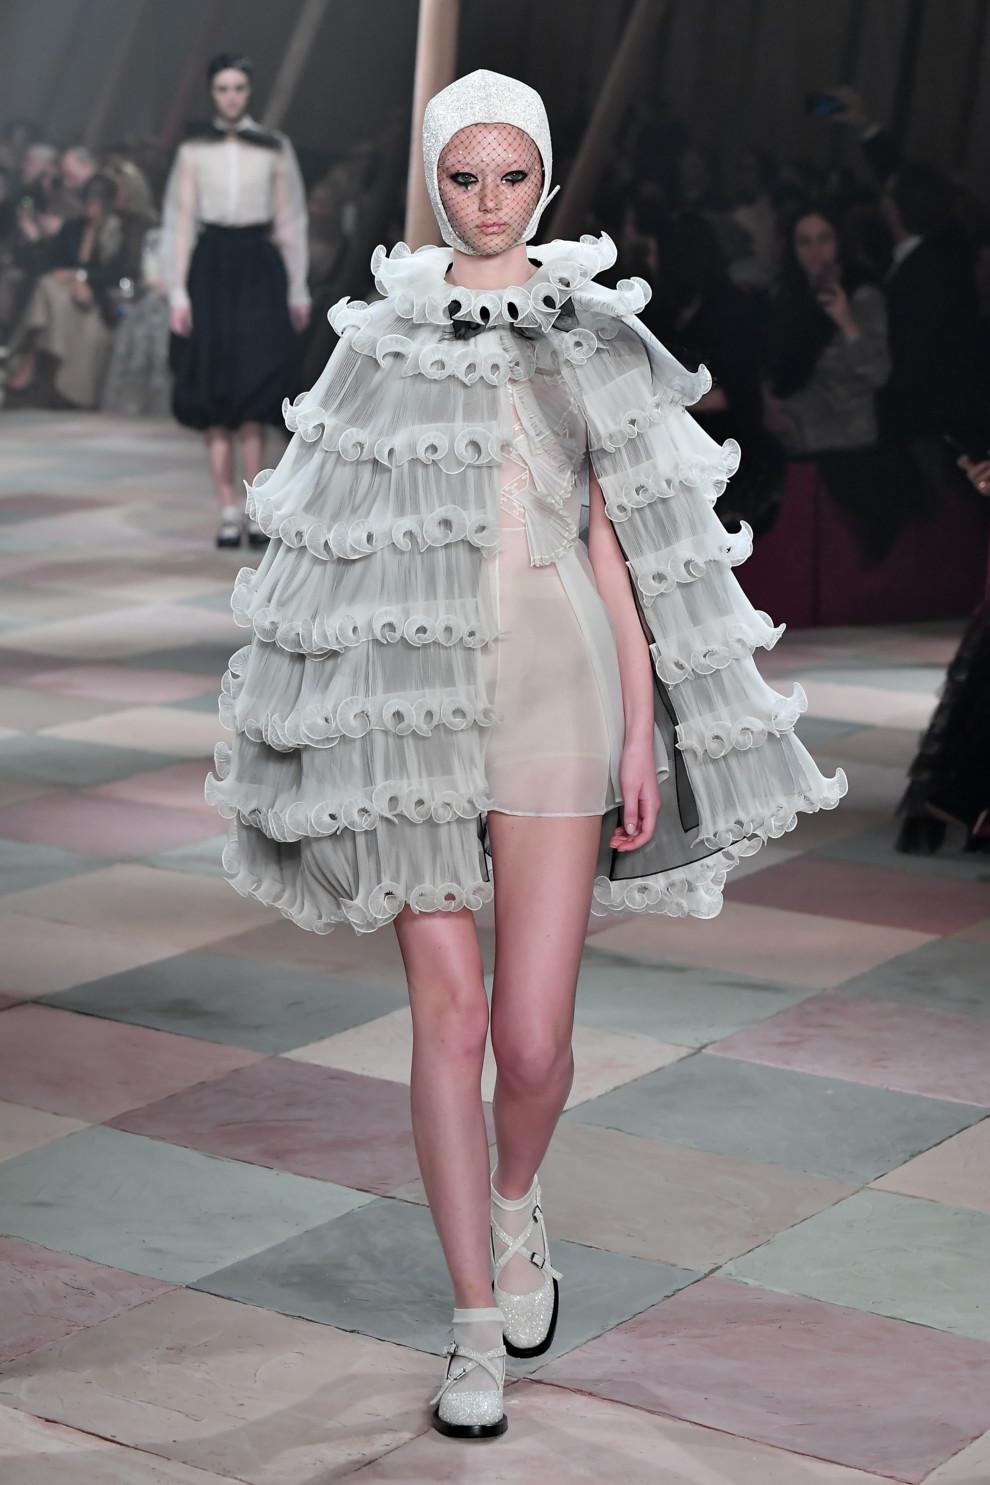 5c46dcb195cac - Плечом к плечу: Dior Couture весна-лето 2019